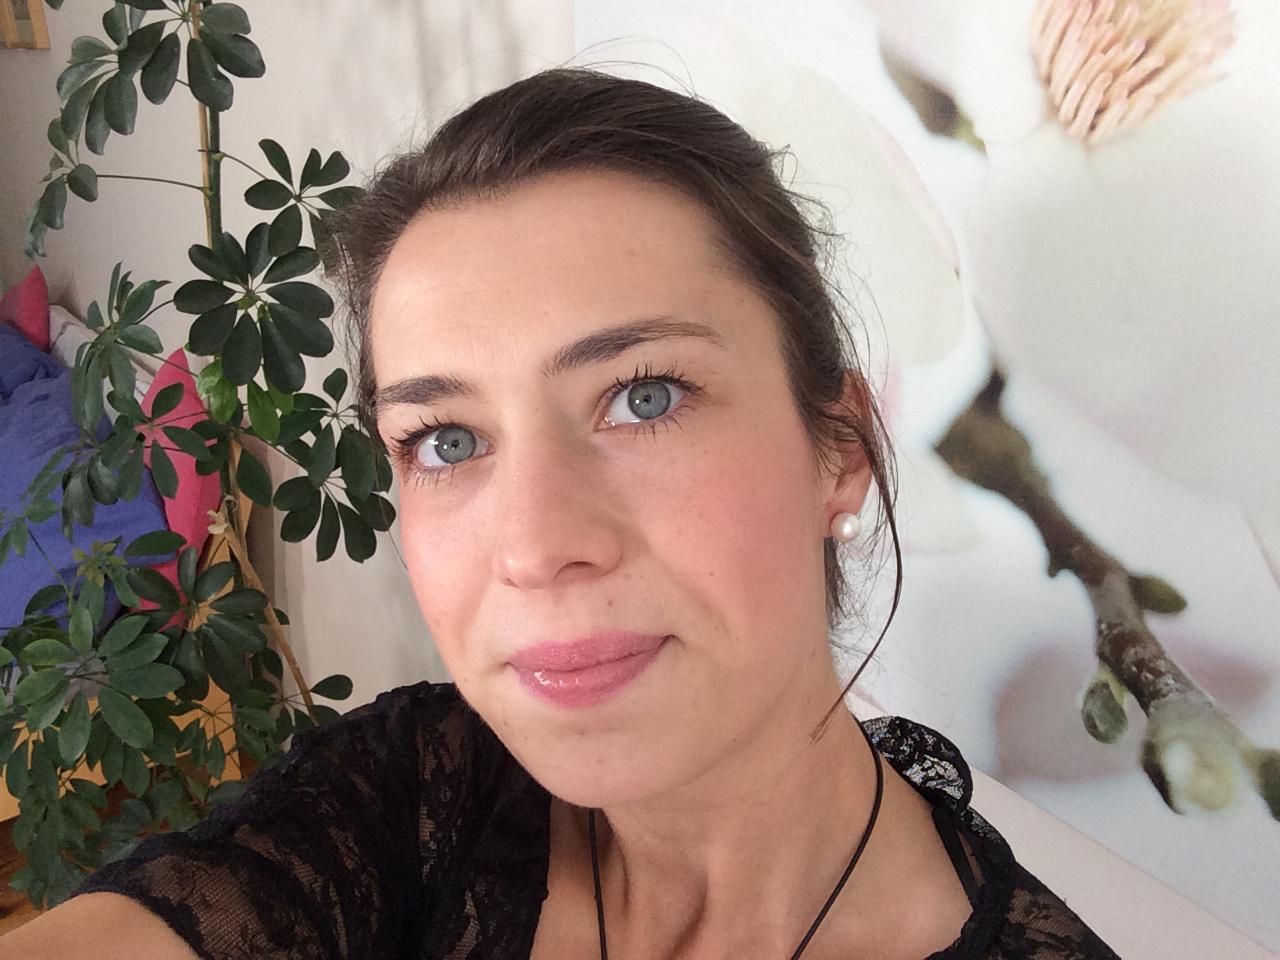 Ersties.com - Freya: The Art of Presentation 1